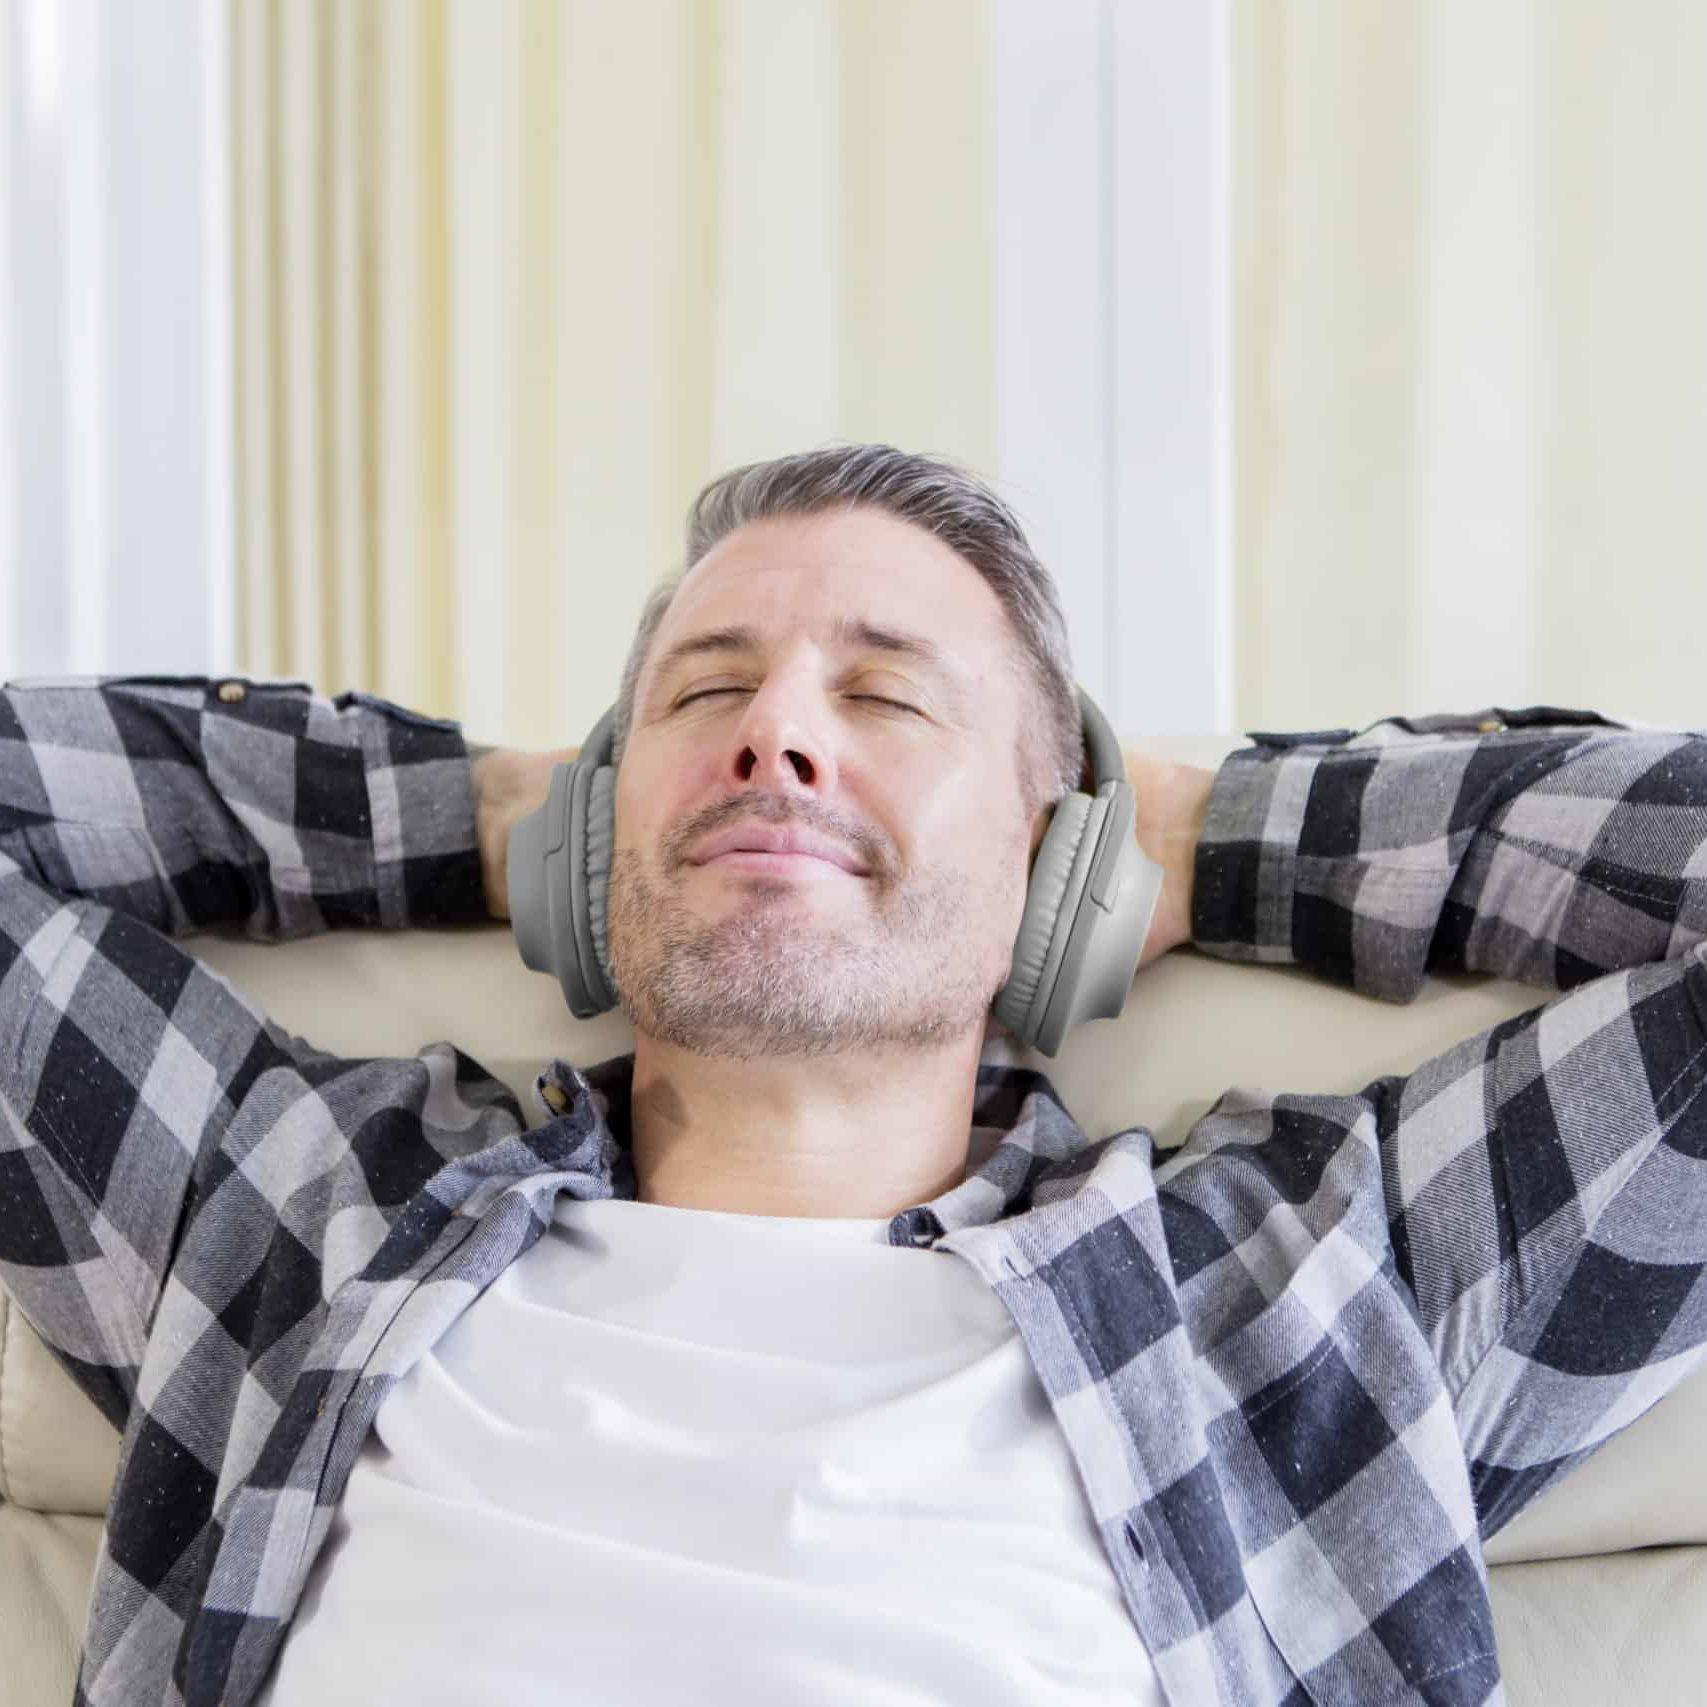 Young man enjoying music with headphones